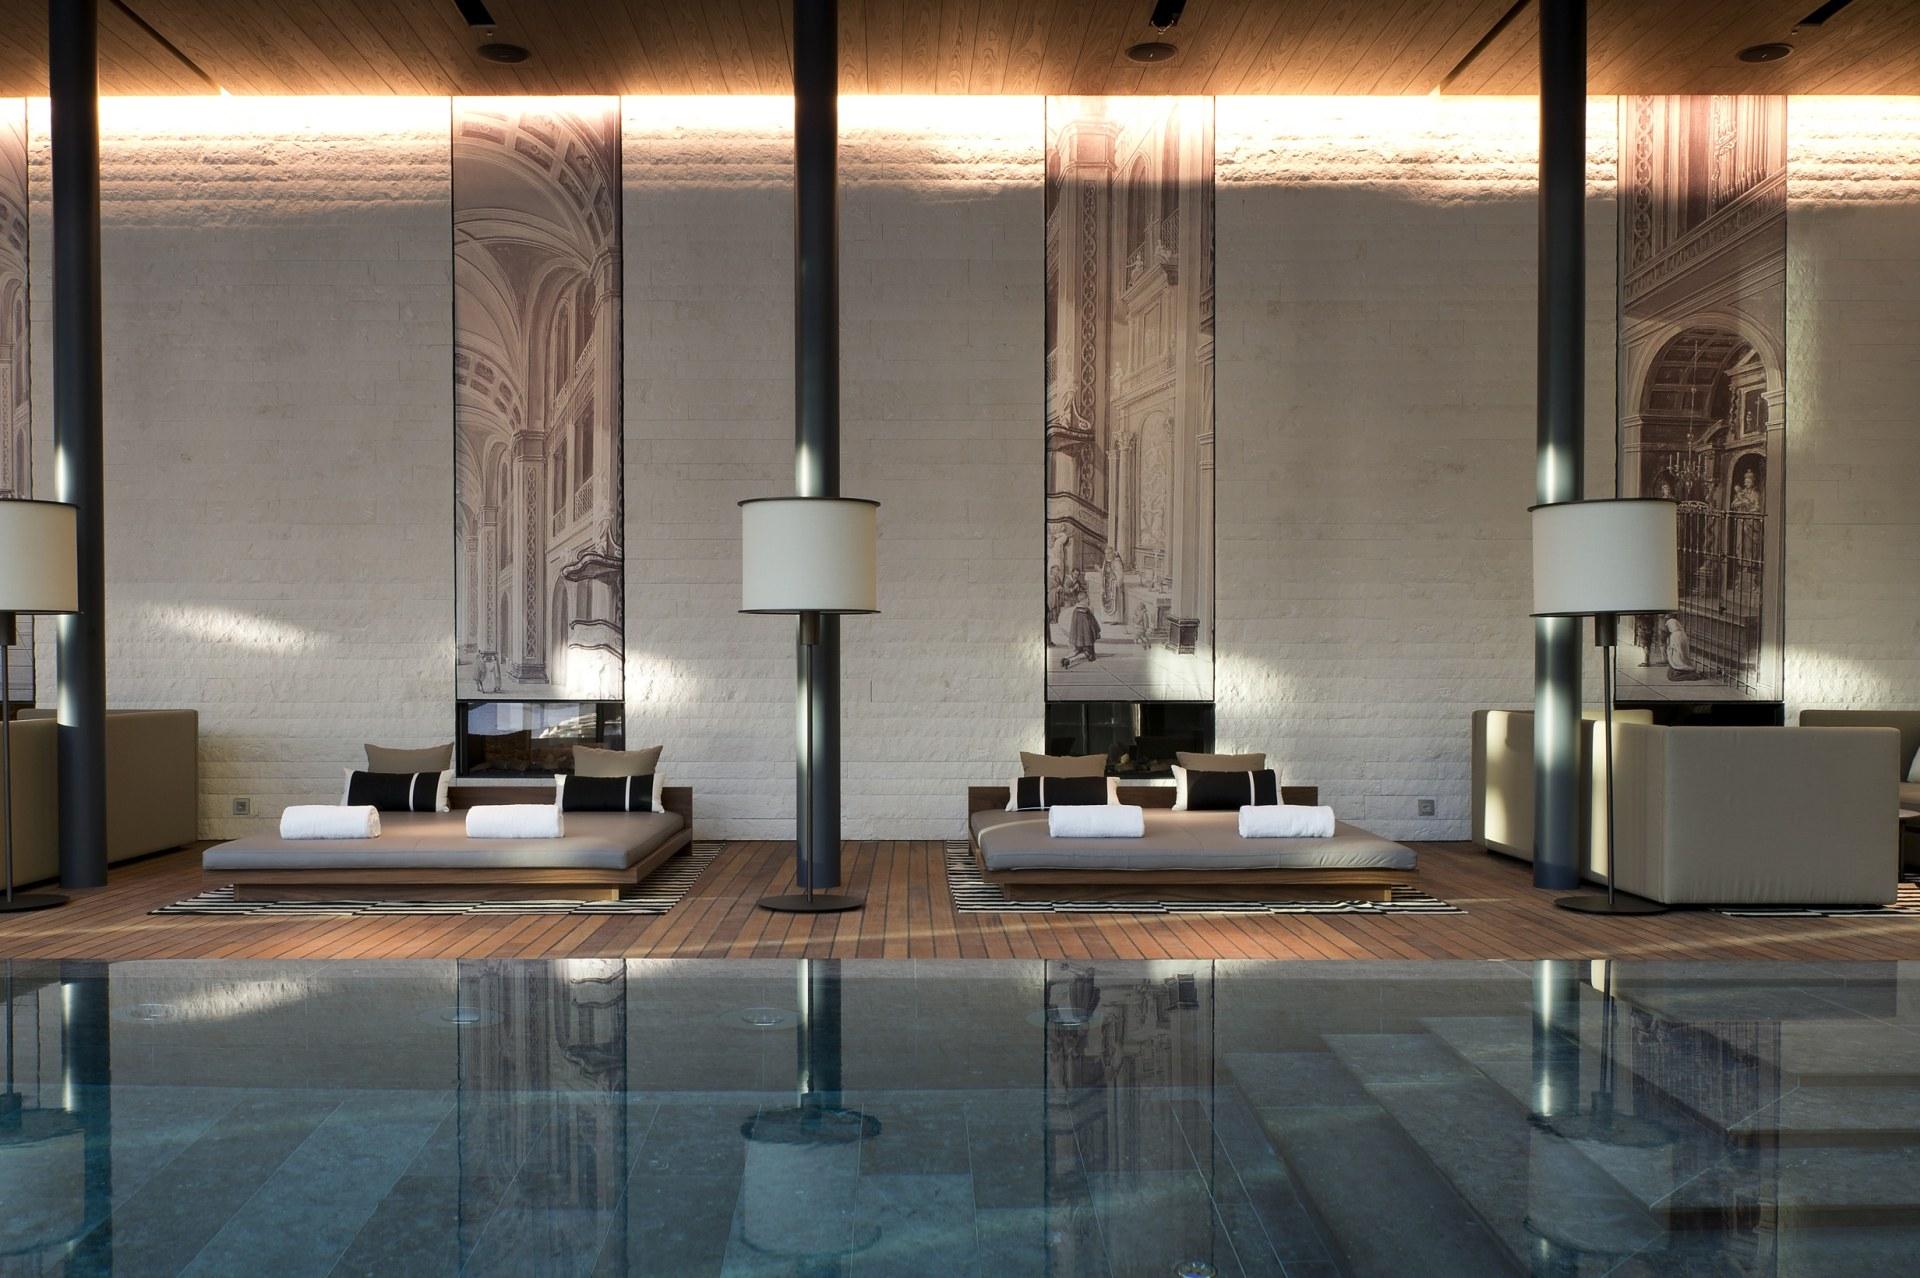 Pool Lounge des Chedi Andermatt